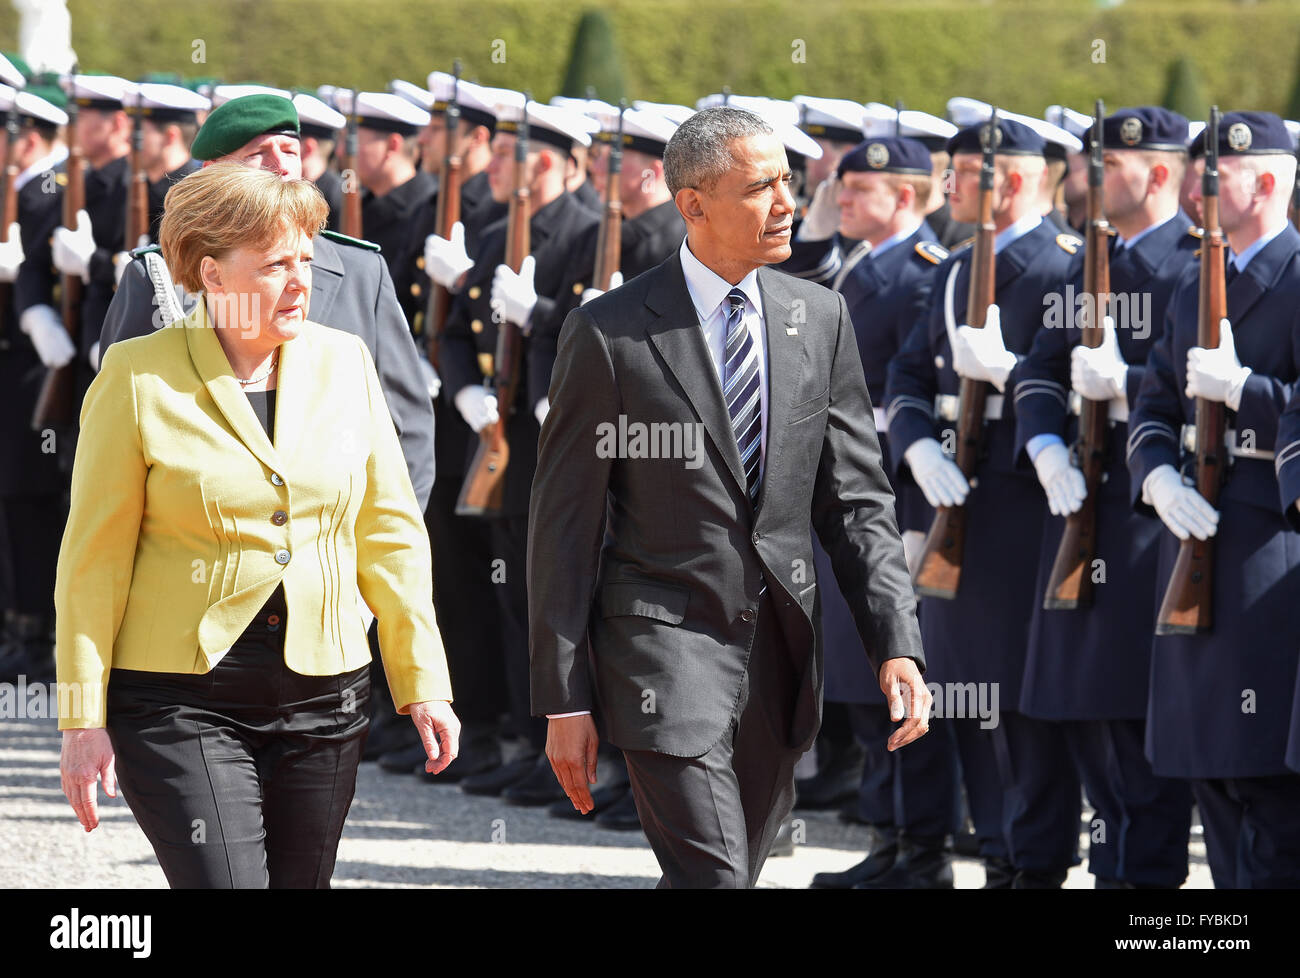 Hanover, Germany. 24th April, 2016. German Chancellor Angela Merkel and U.S. President Barack Obama during military - Stock Image